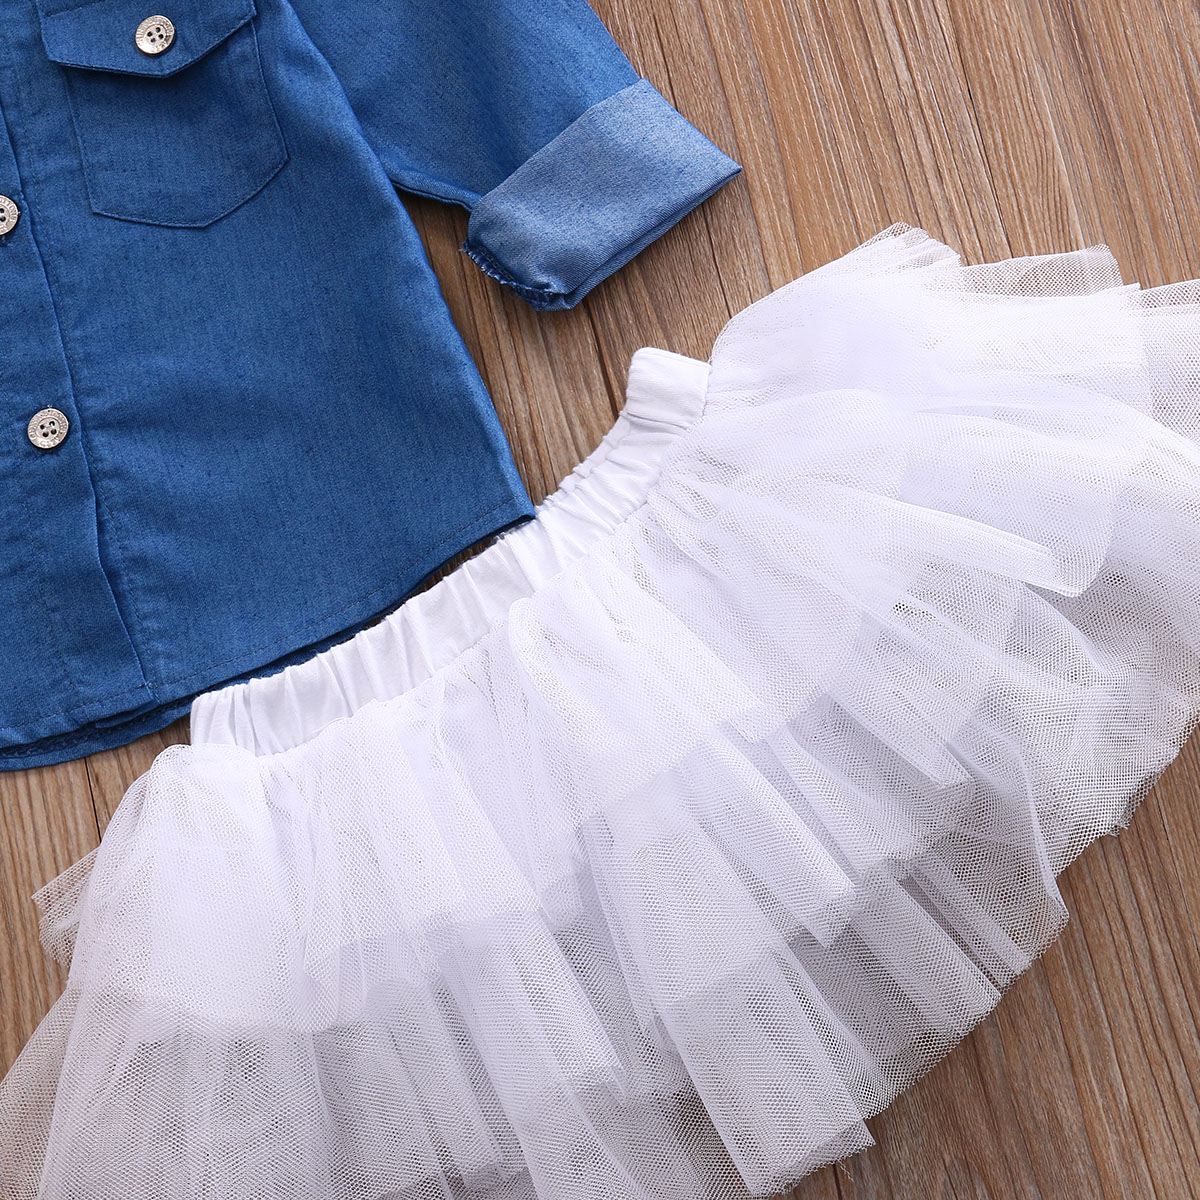 3PCS-Toddler-Kids-Baby-Girl-Clothes-Set-Denim-Tops-T-shirt-Tutu-Skirt-Headband-Outfits-Summer-Cowboy-Suit-Children-Set-0-5Y-4